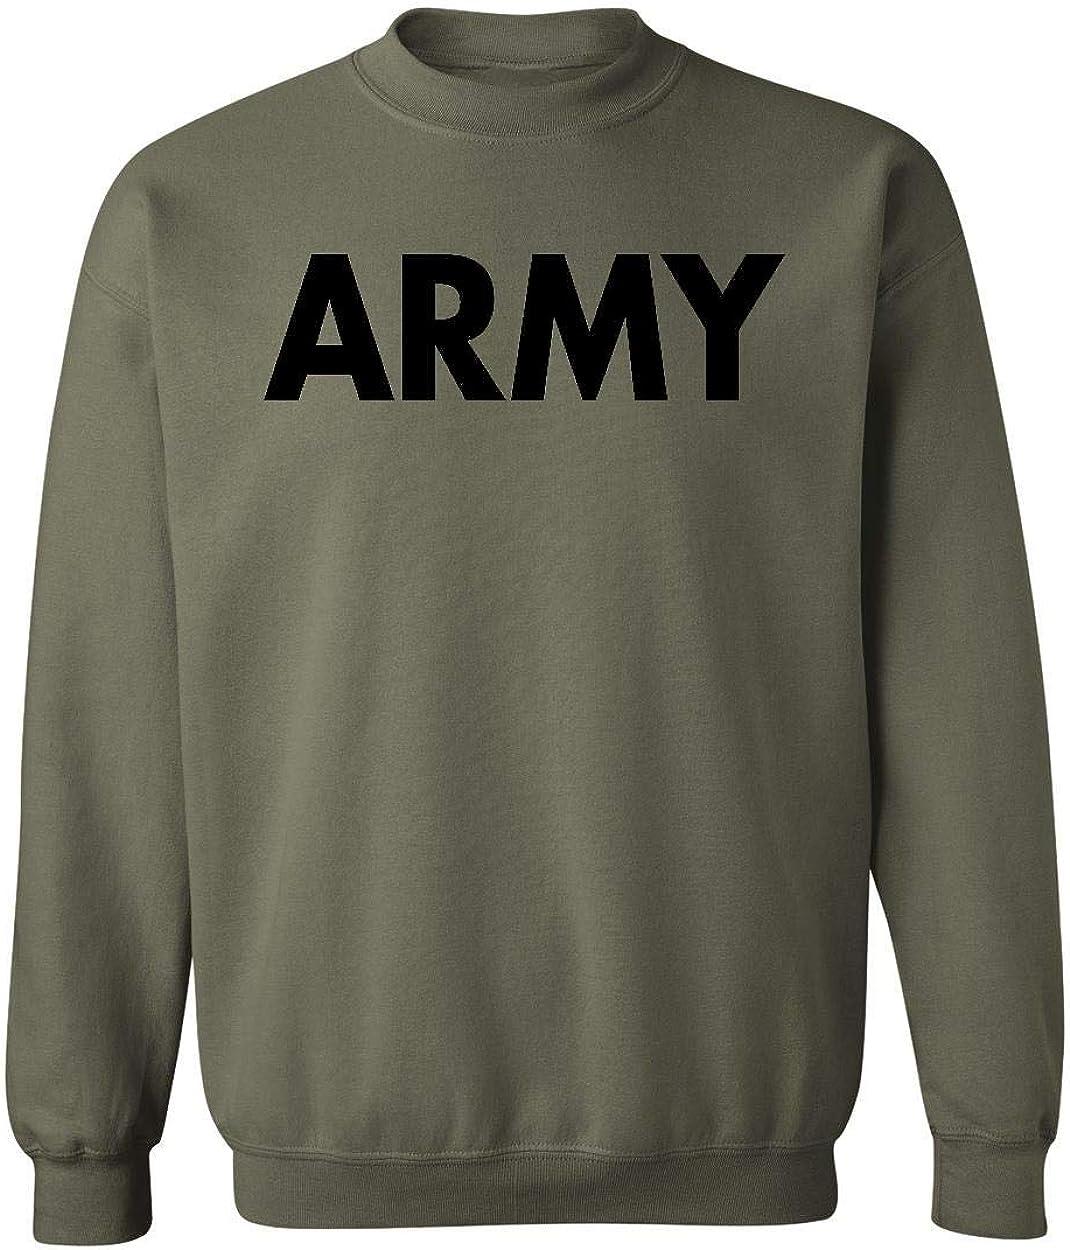 US Military Gear Army Training PT Crewneck Sweatshirt